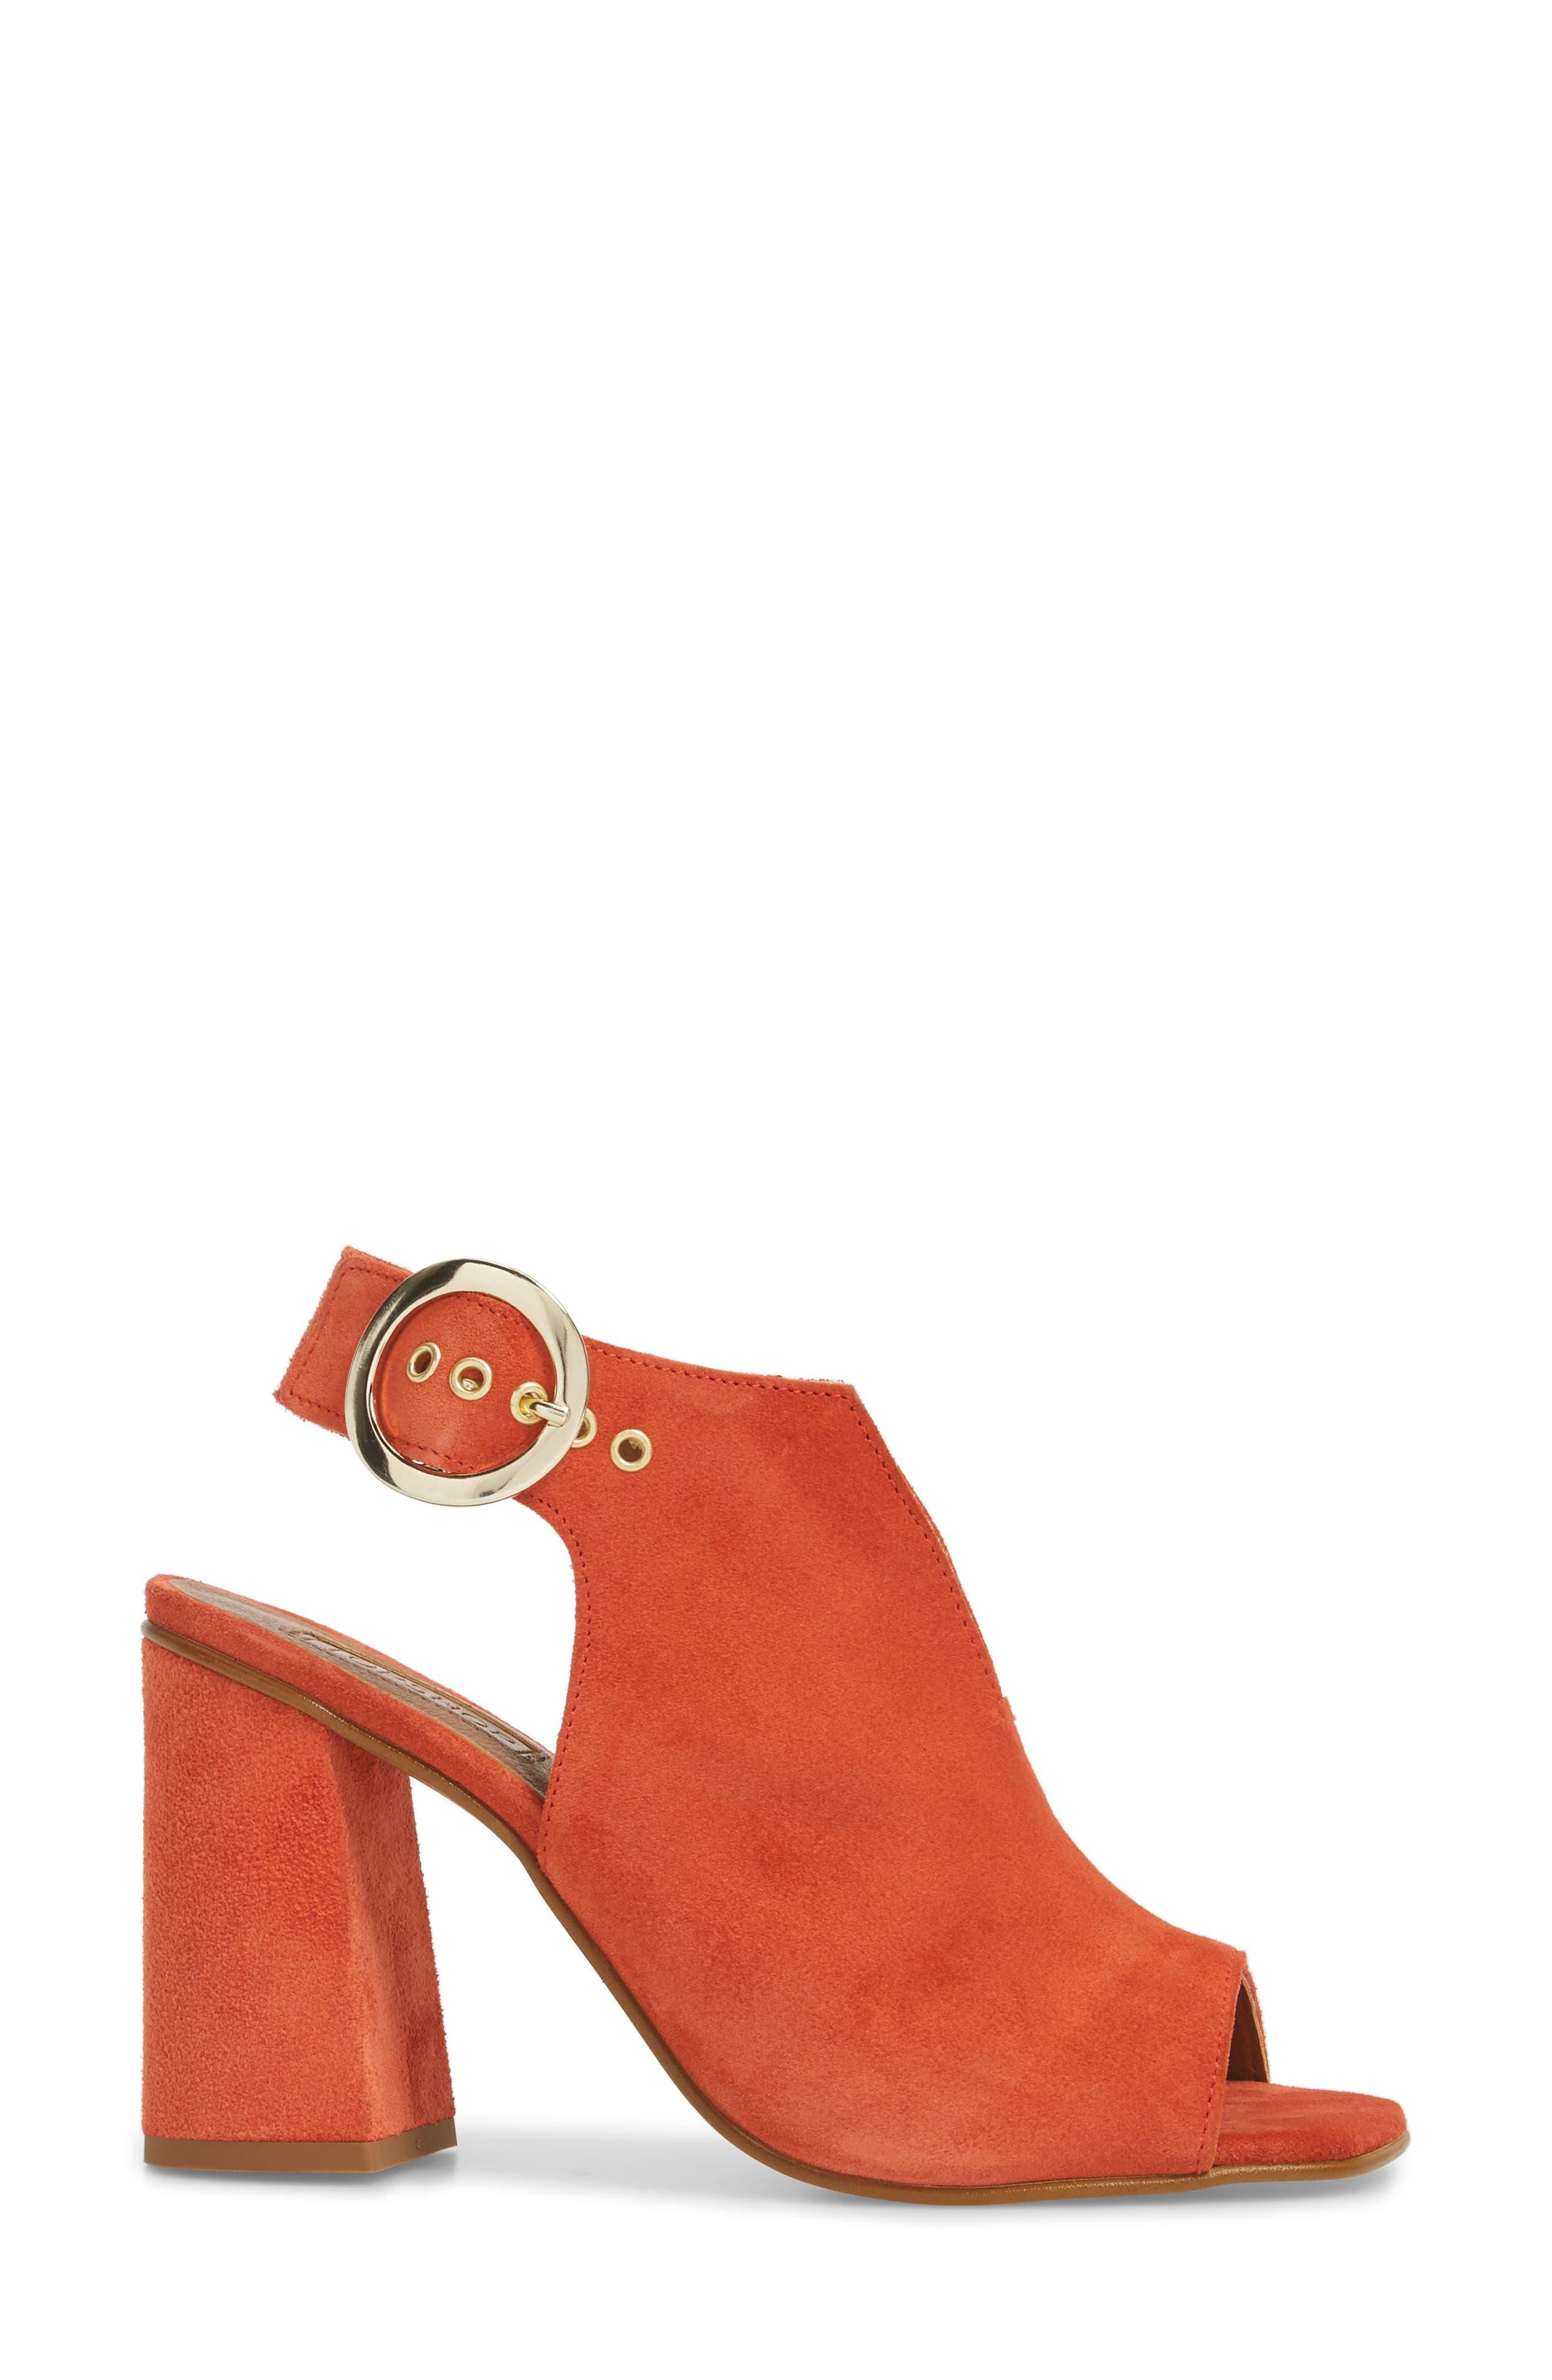 Nika Flared Heel Slingback Sandal,                             Alternate thumbnail 6, color,